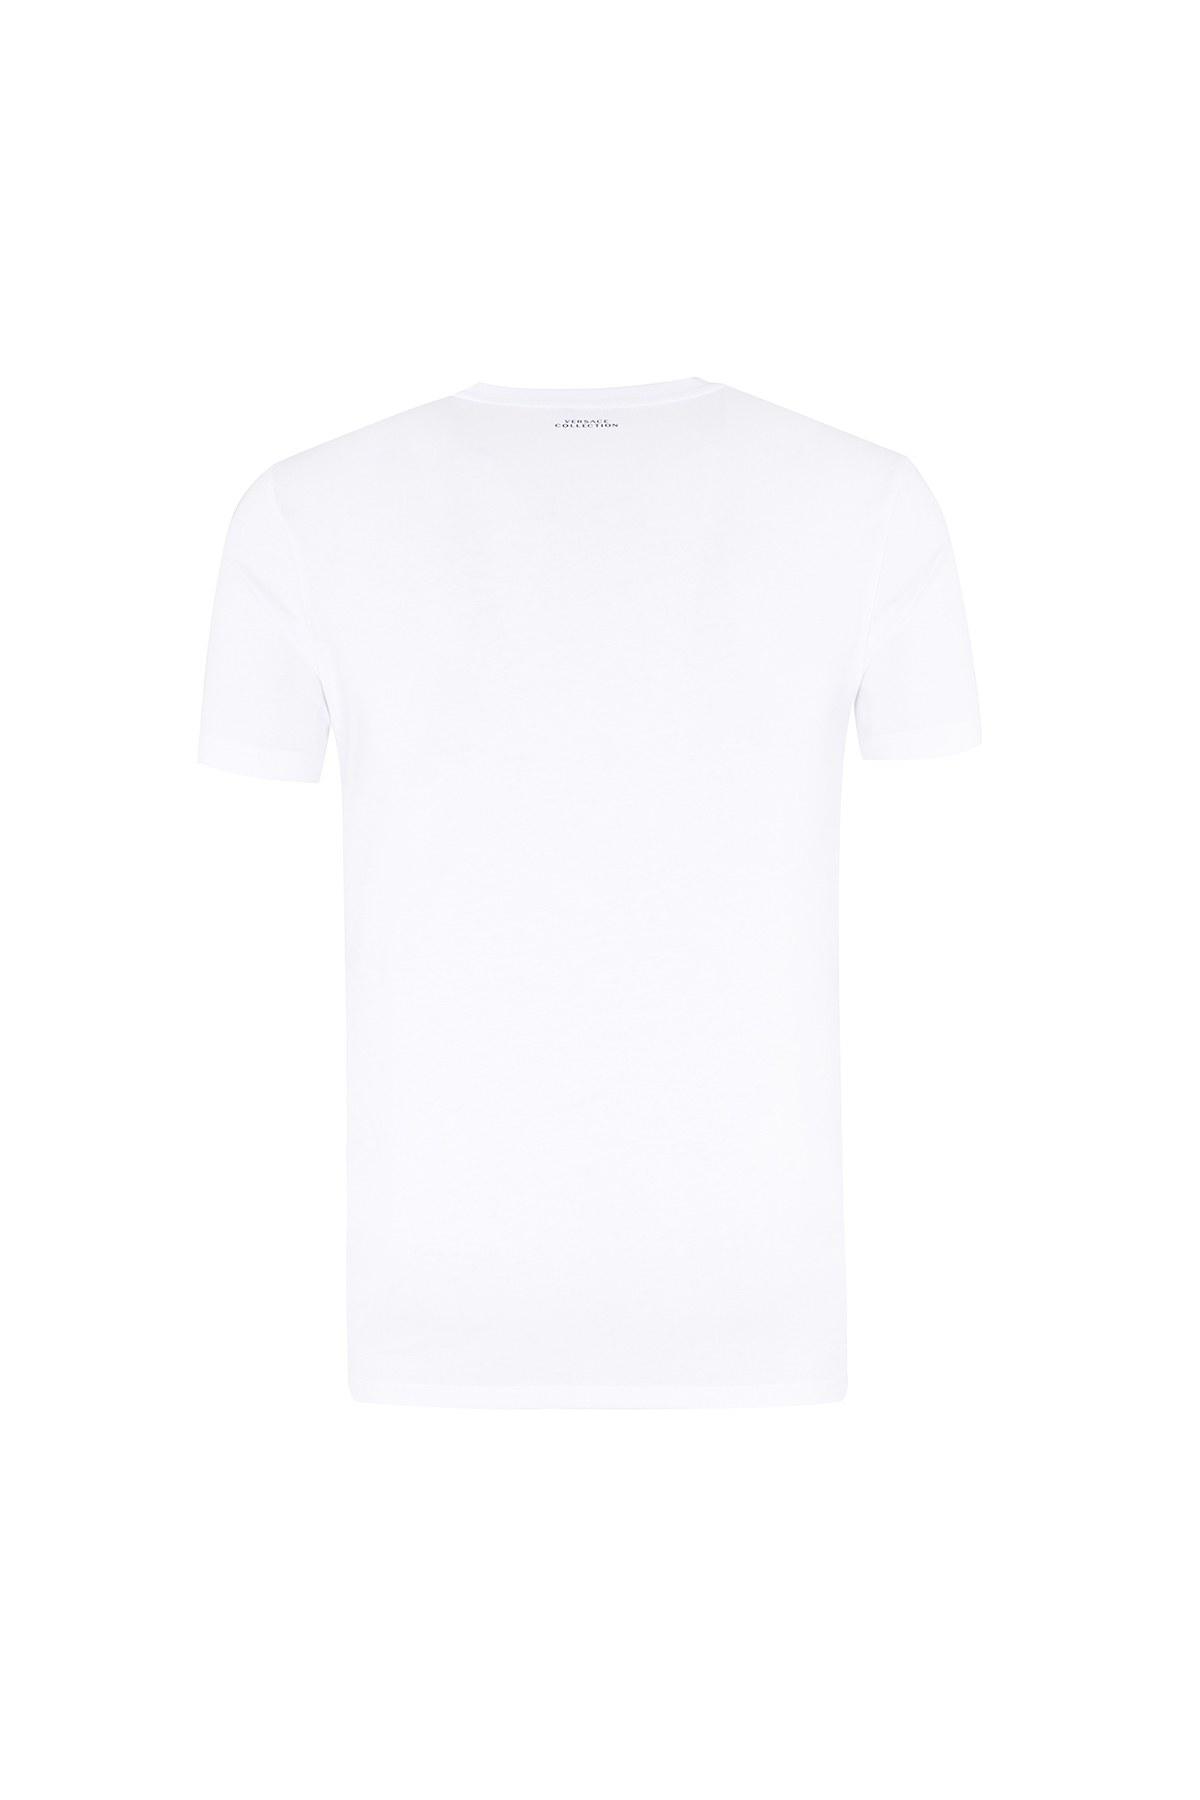 VERSACE COLLECTION T SHIRT Erkek T Shirt V800683S VJ00477 V1001 BEYAZ